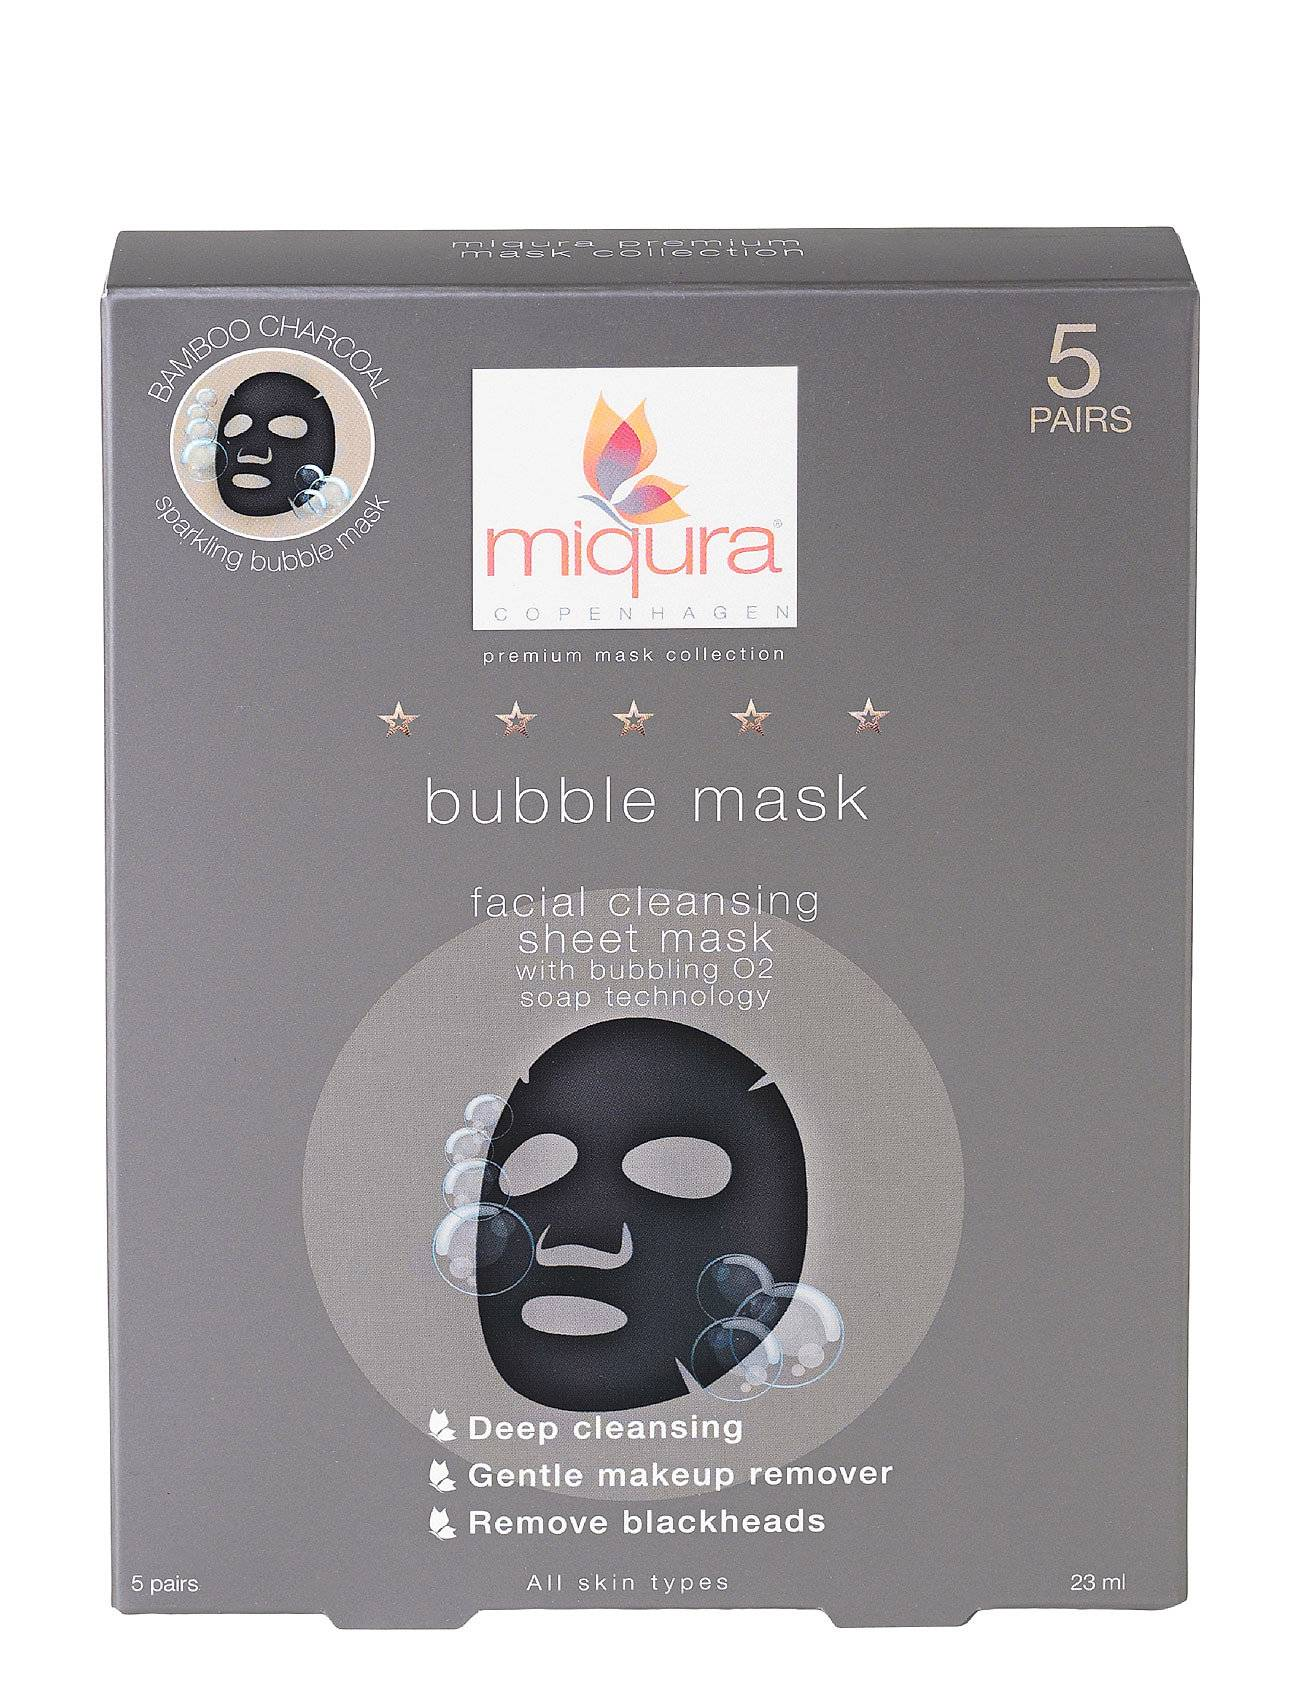 Miqura Bubble Mask (5 Pair) Box